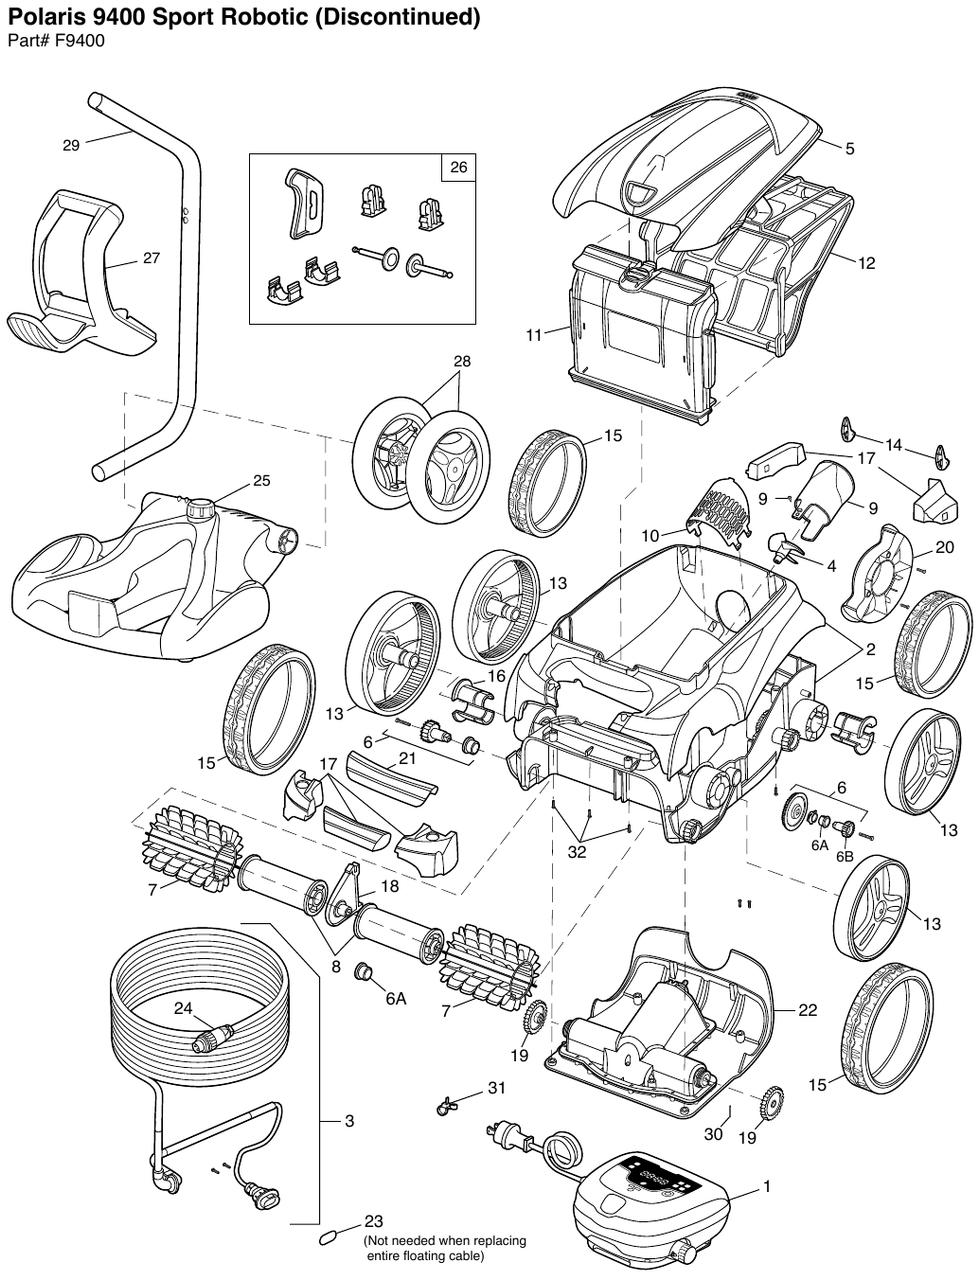 hight resolution of polaris 9400 parts